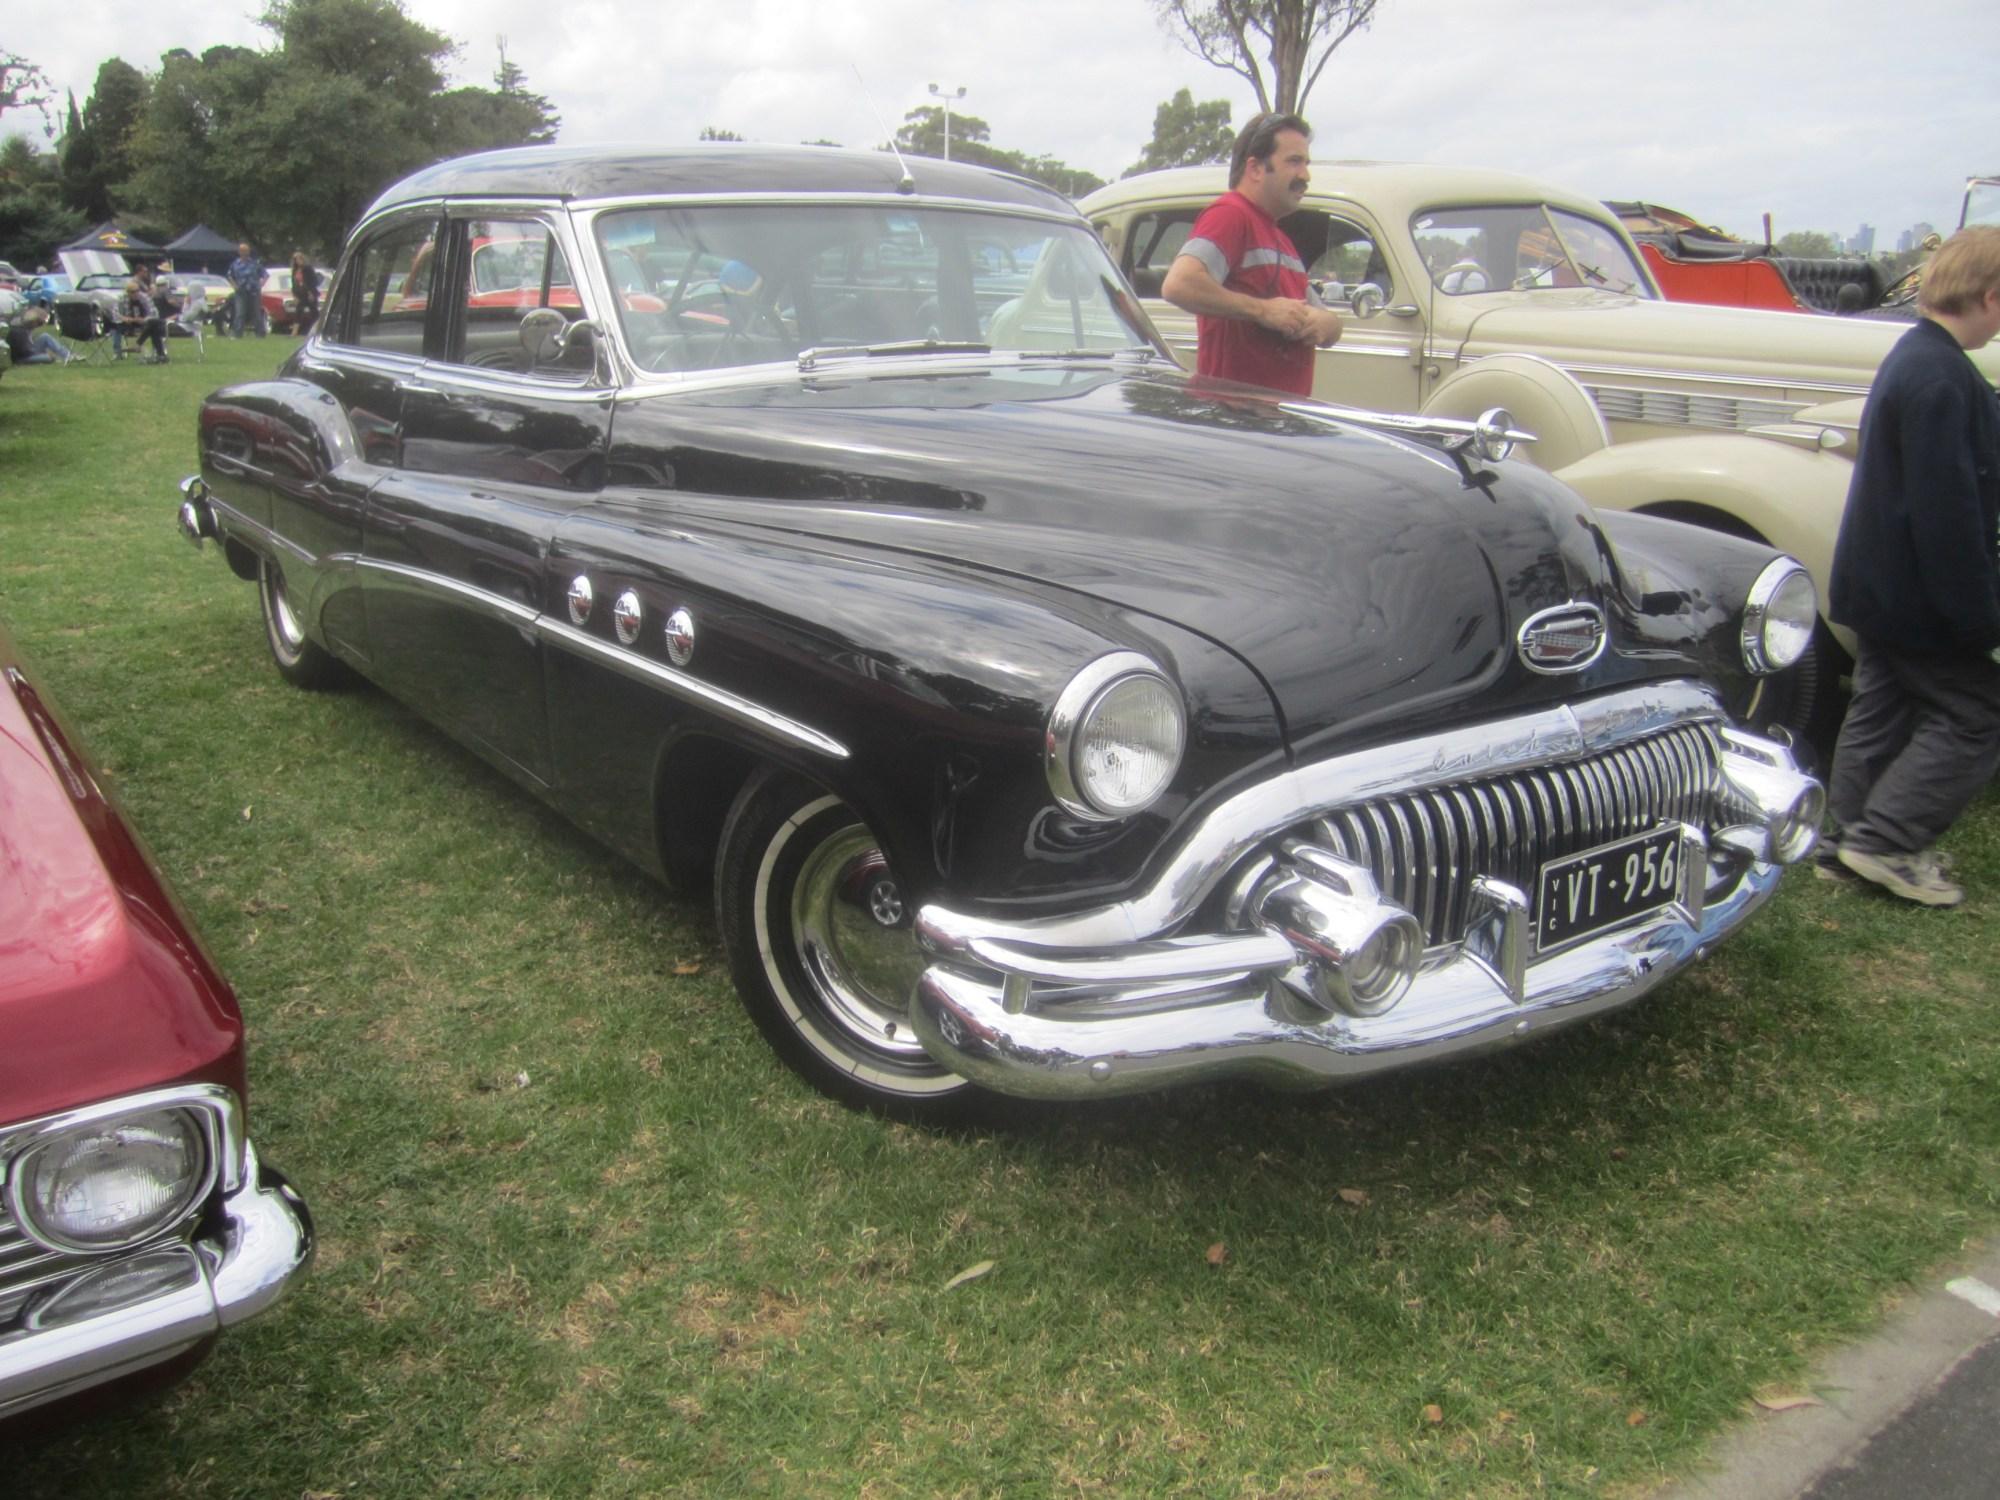 hight resolution of file 1952 buick series 40 special sedan jpg wikimedia commons rh commons wikimedia org 1952 oldsmobile